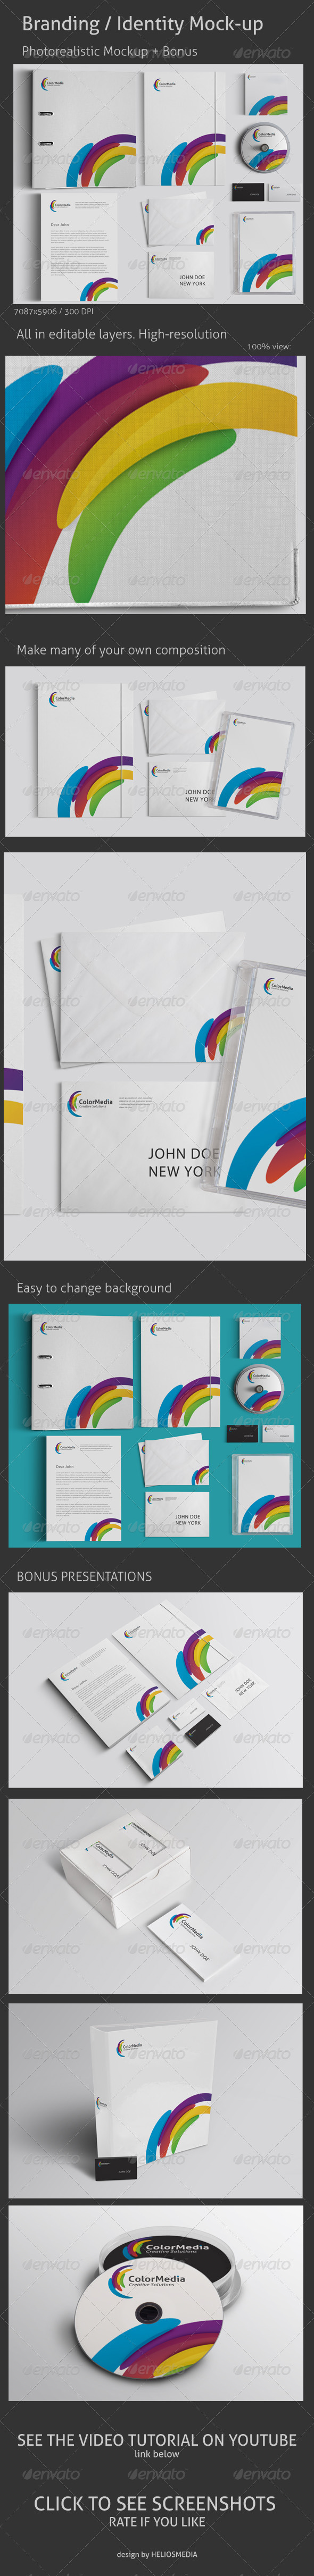 GraphicRiver Branding Identity Mock-up 3277323